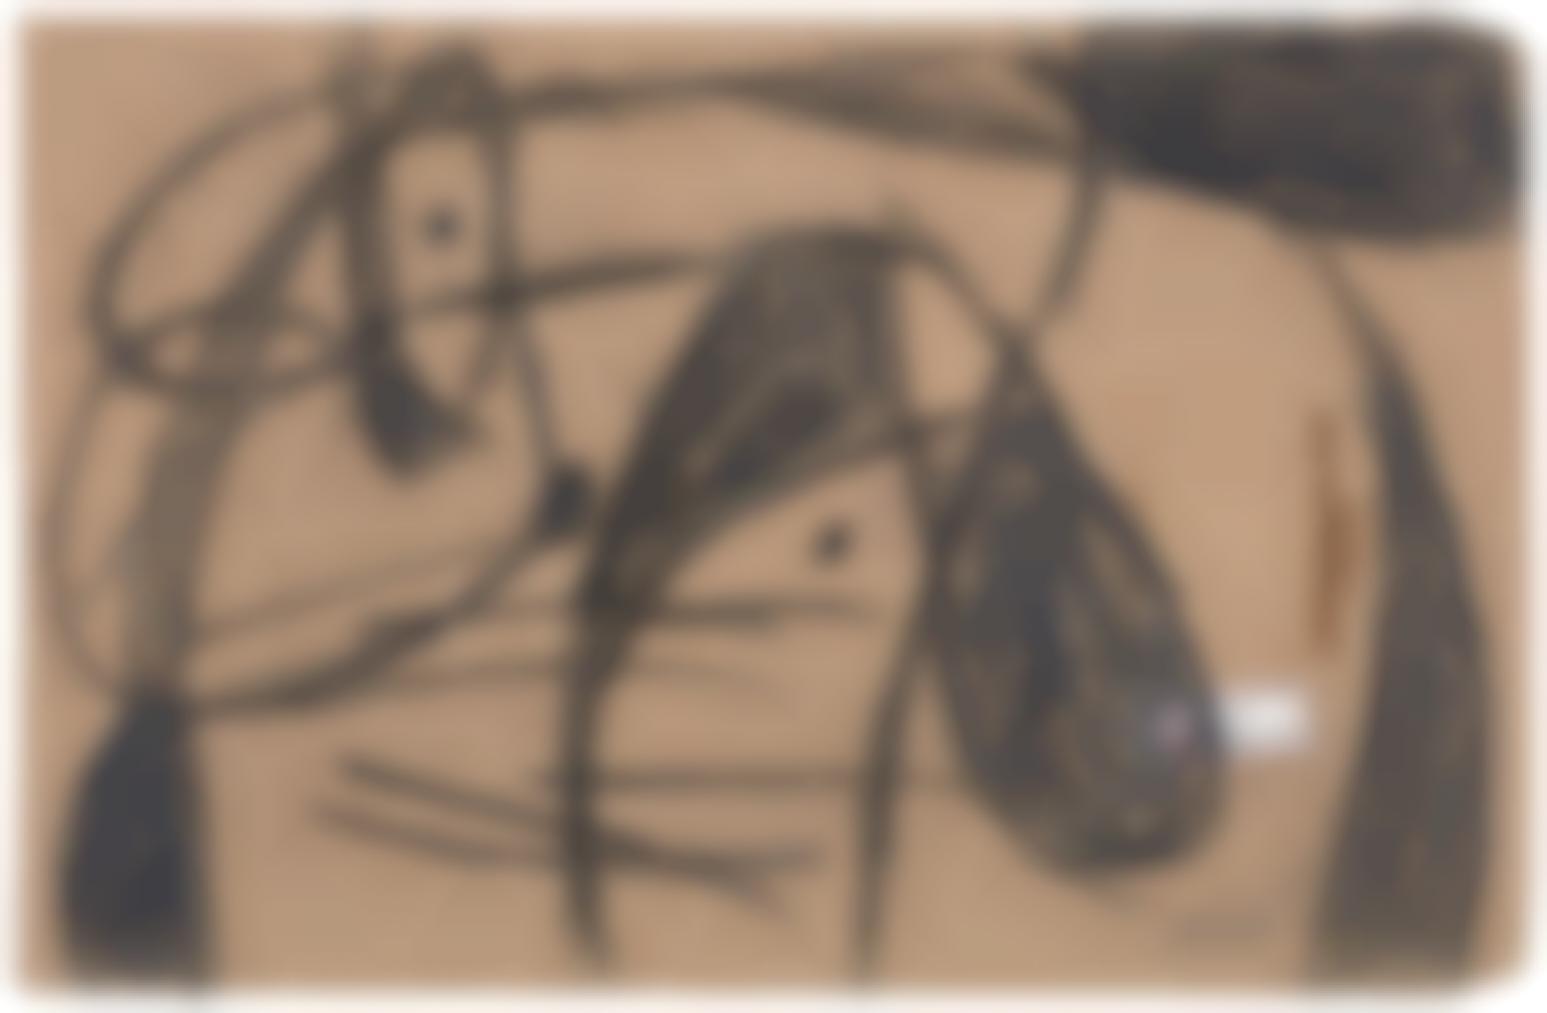 Joan Miro-Personnage-1977